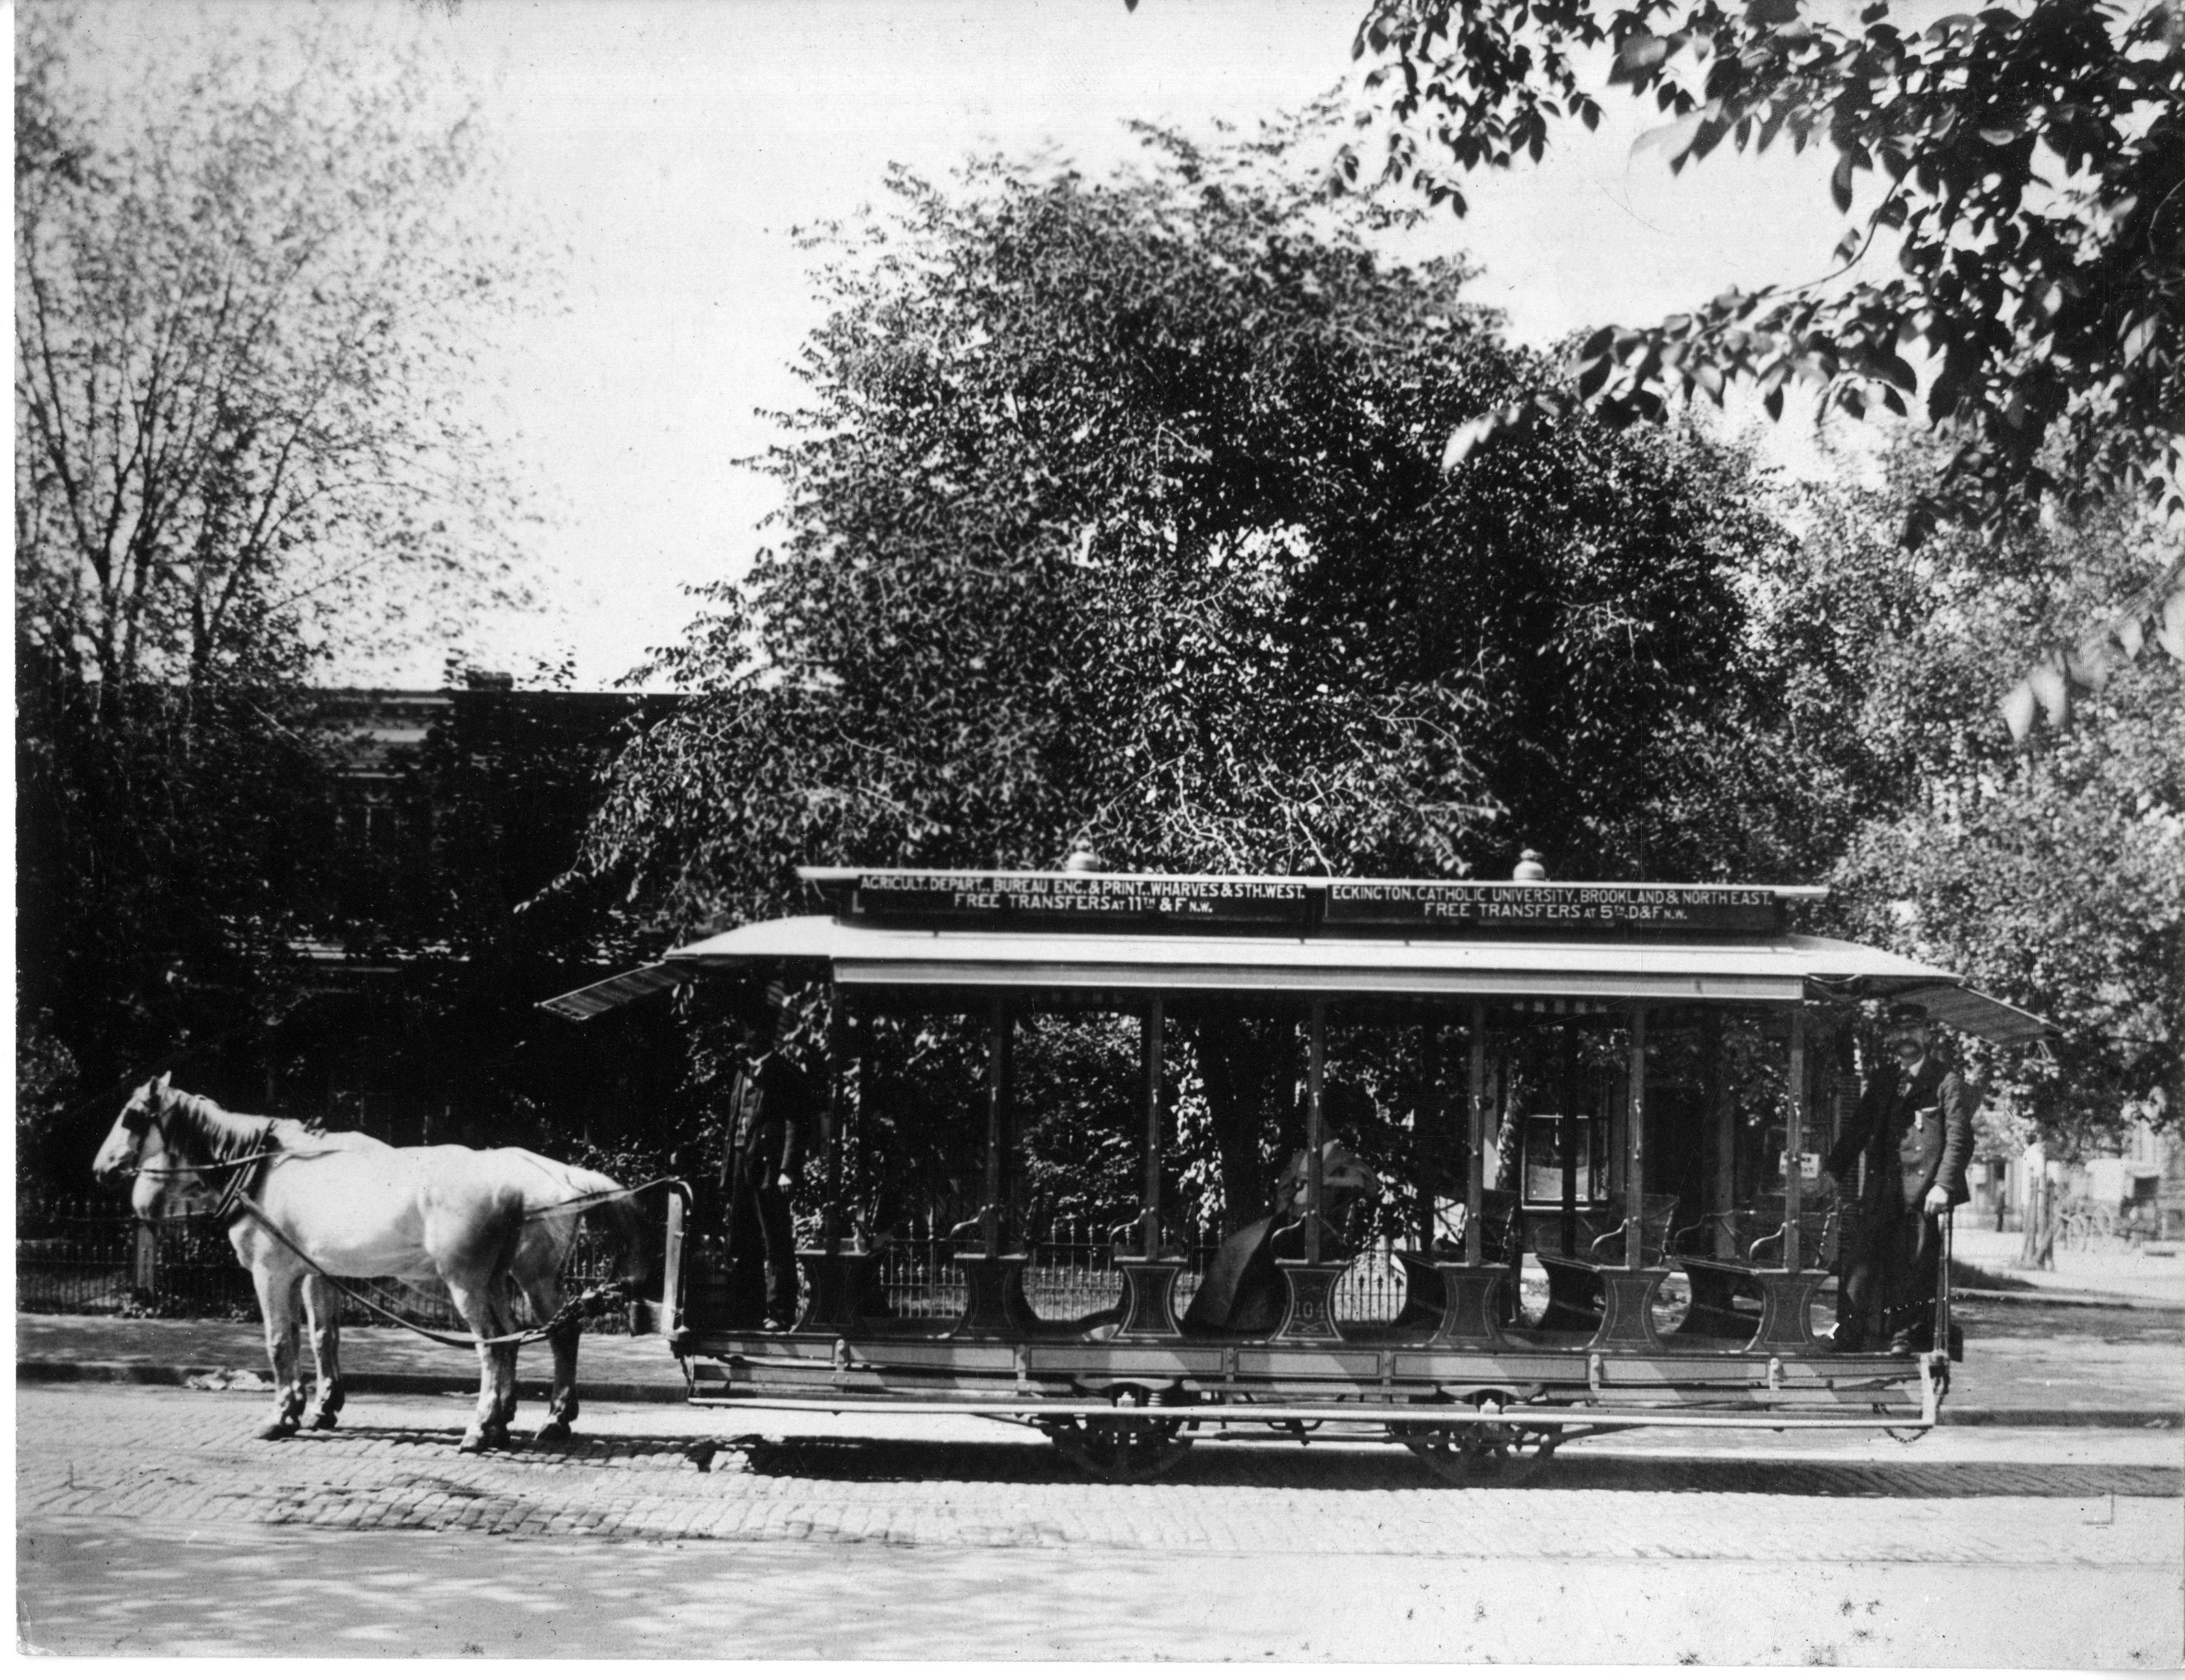 Horse car on East Capitol St. Washington DC, 1890.